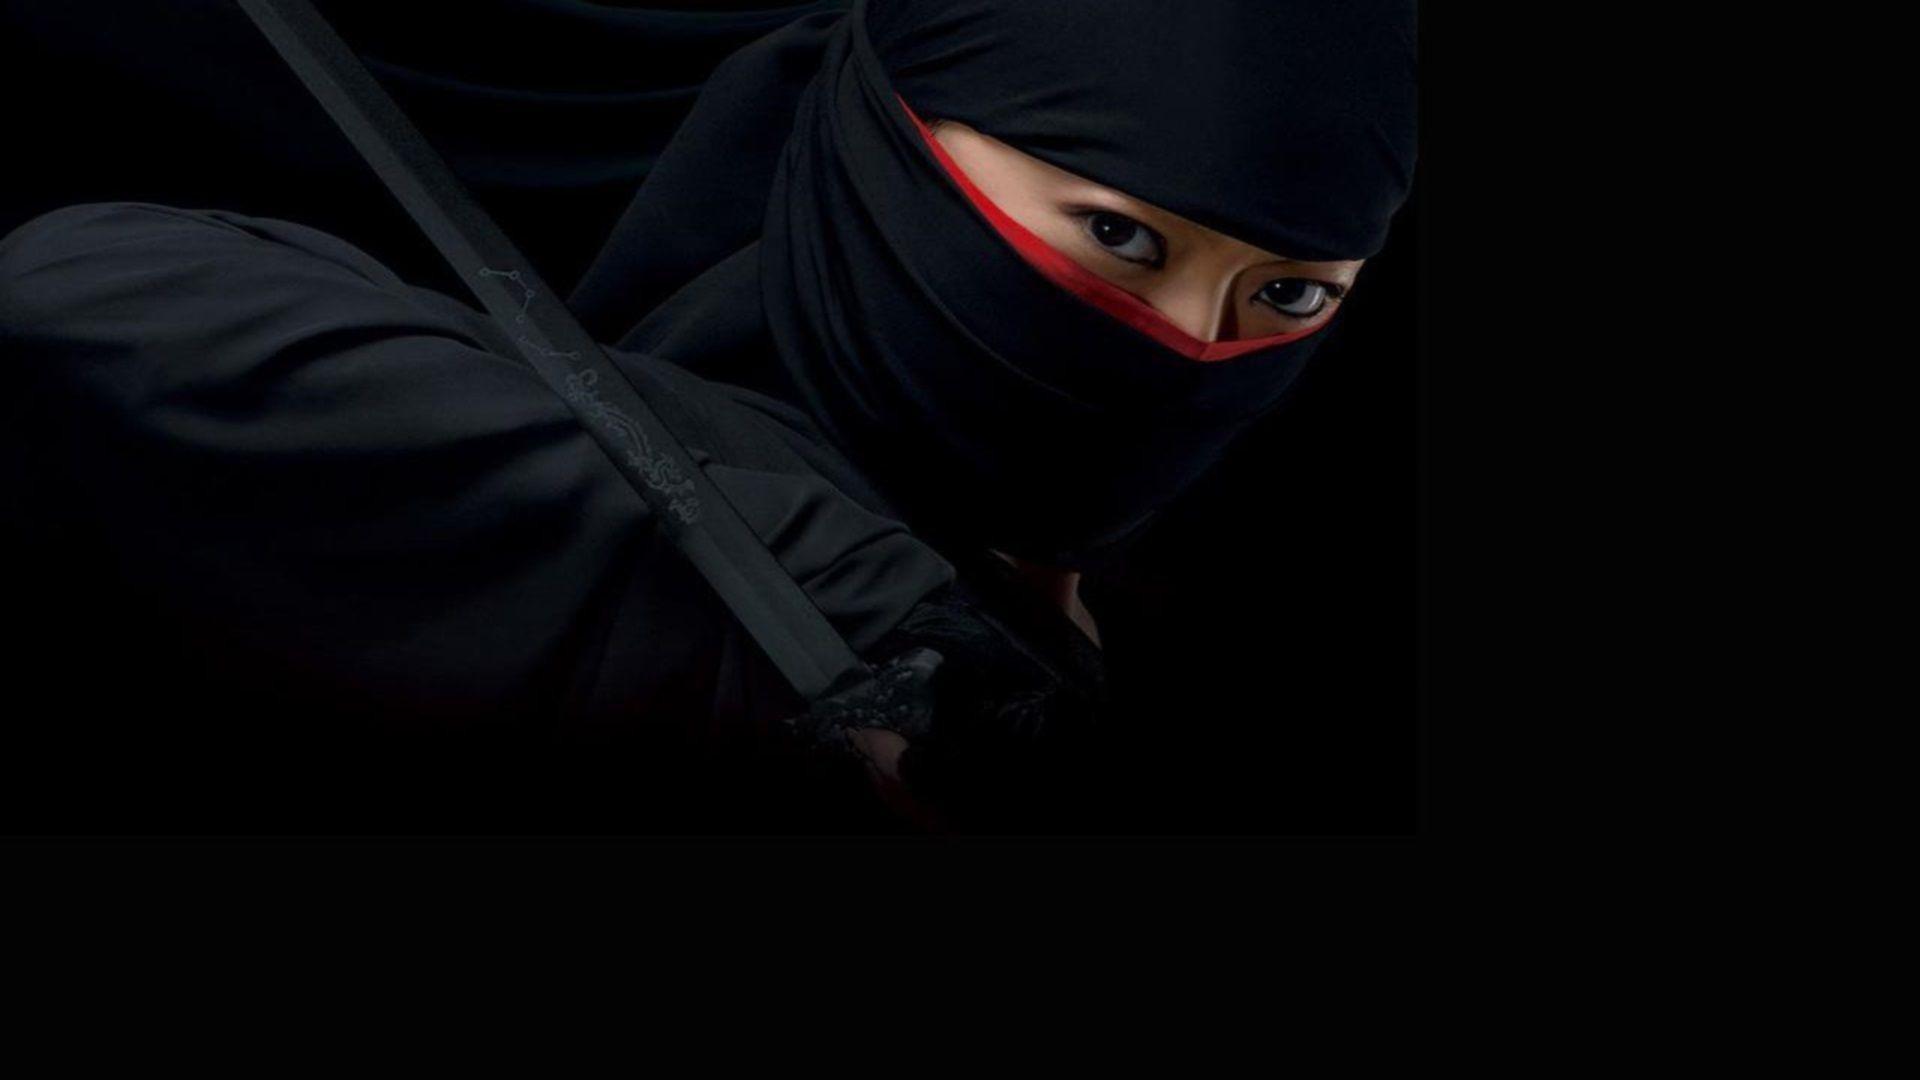 Ninja a wallpaper